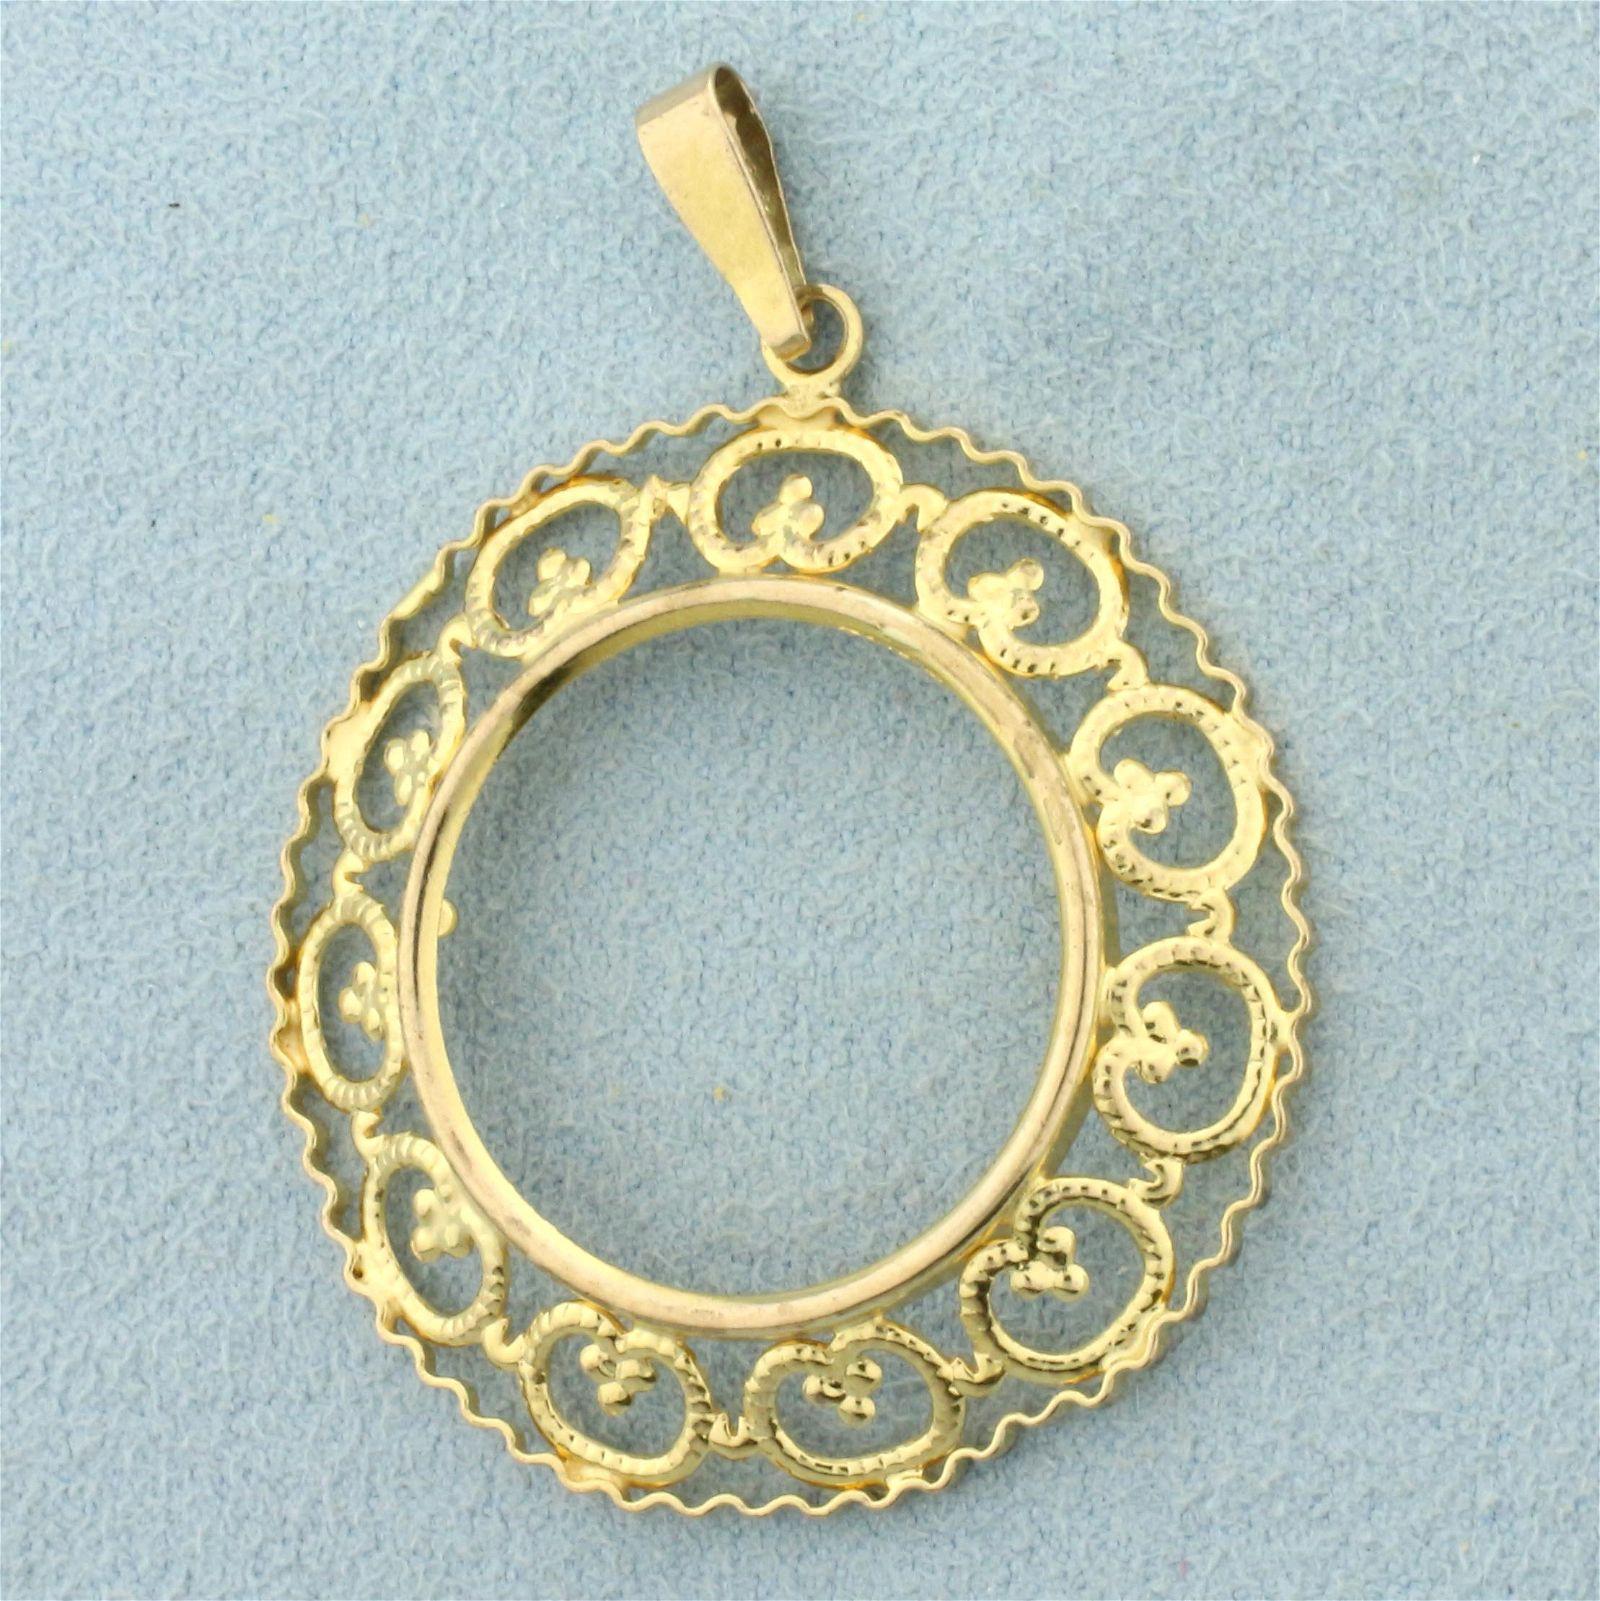 22mm Coin Bezel Pendant in 9K Yellow Gold